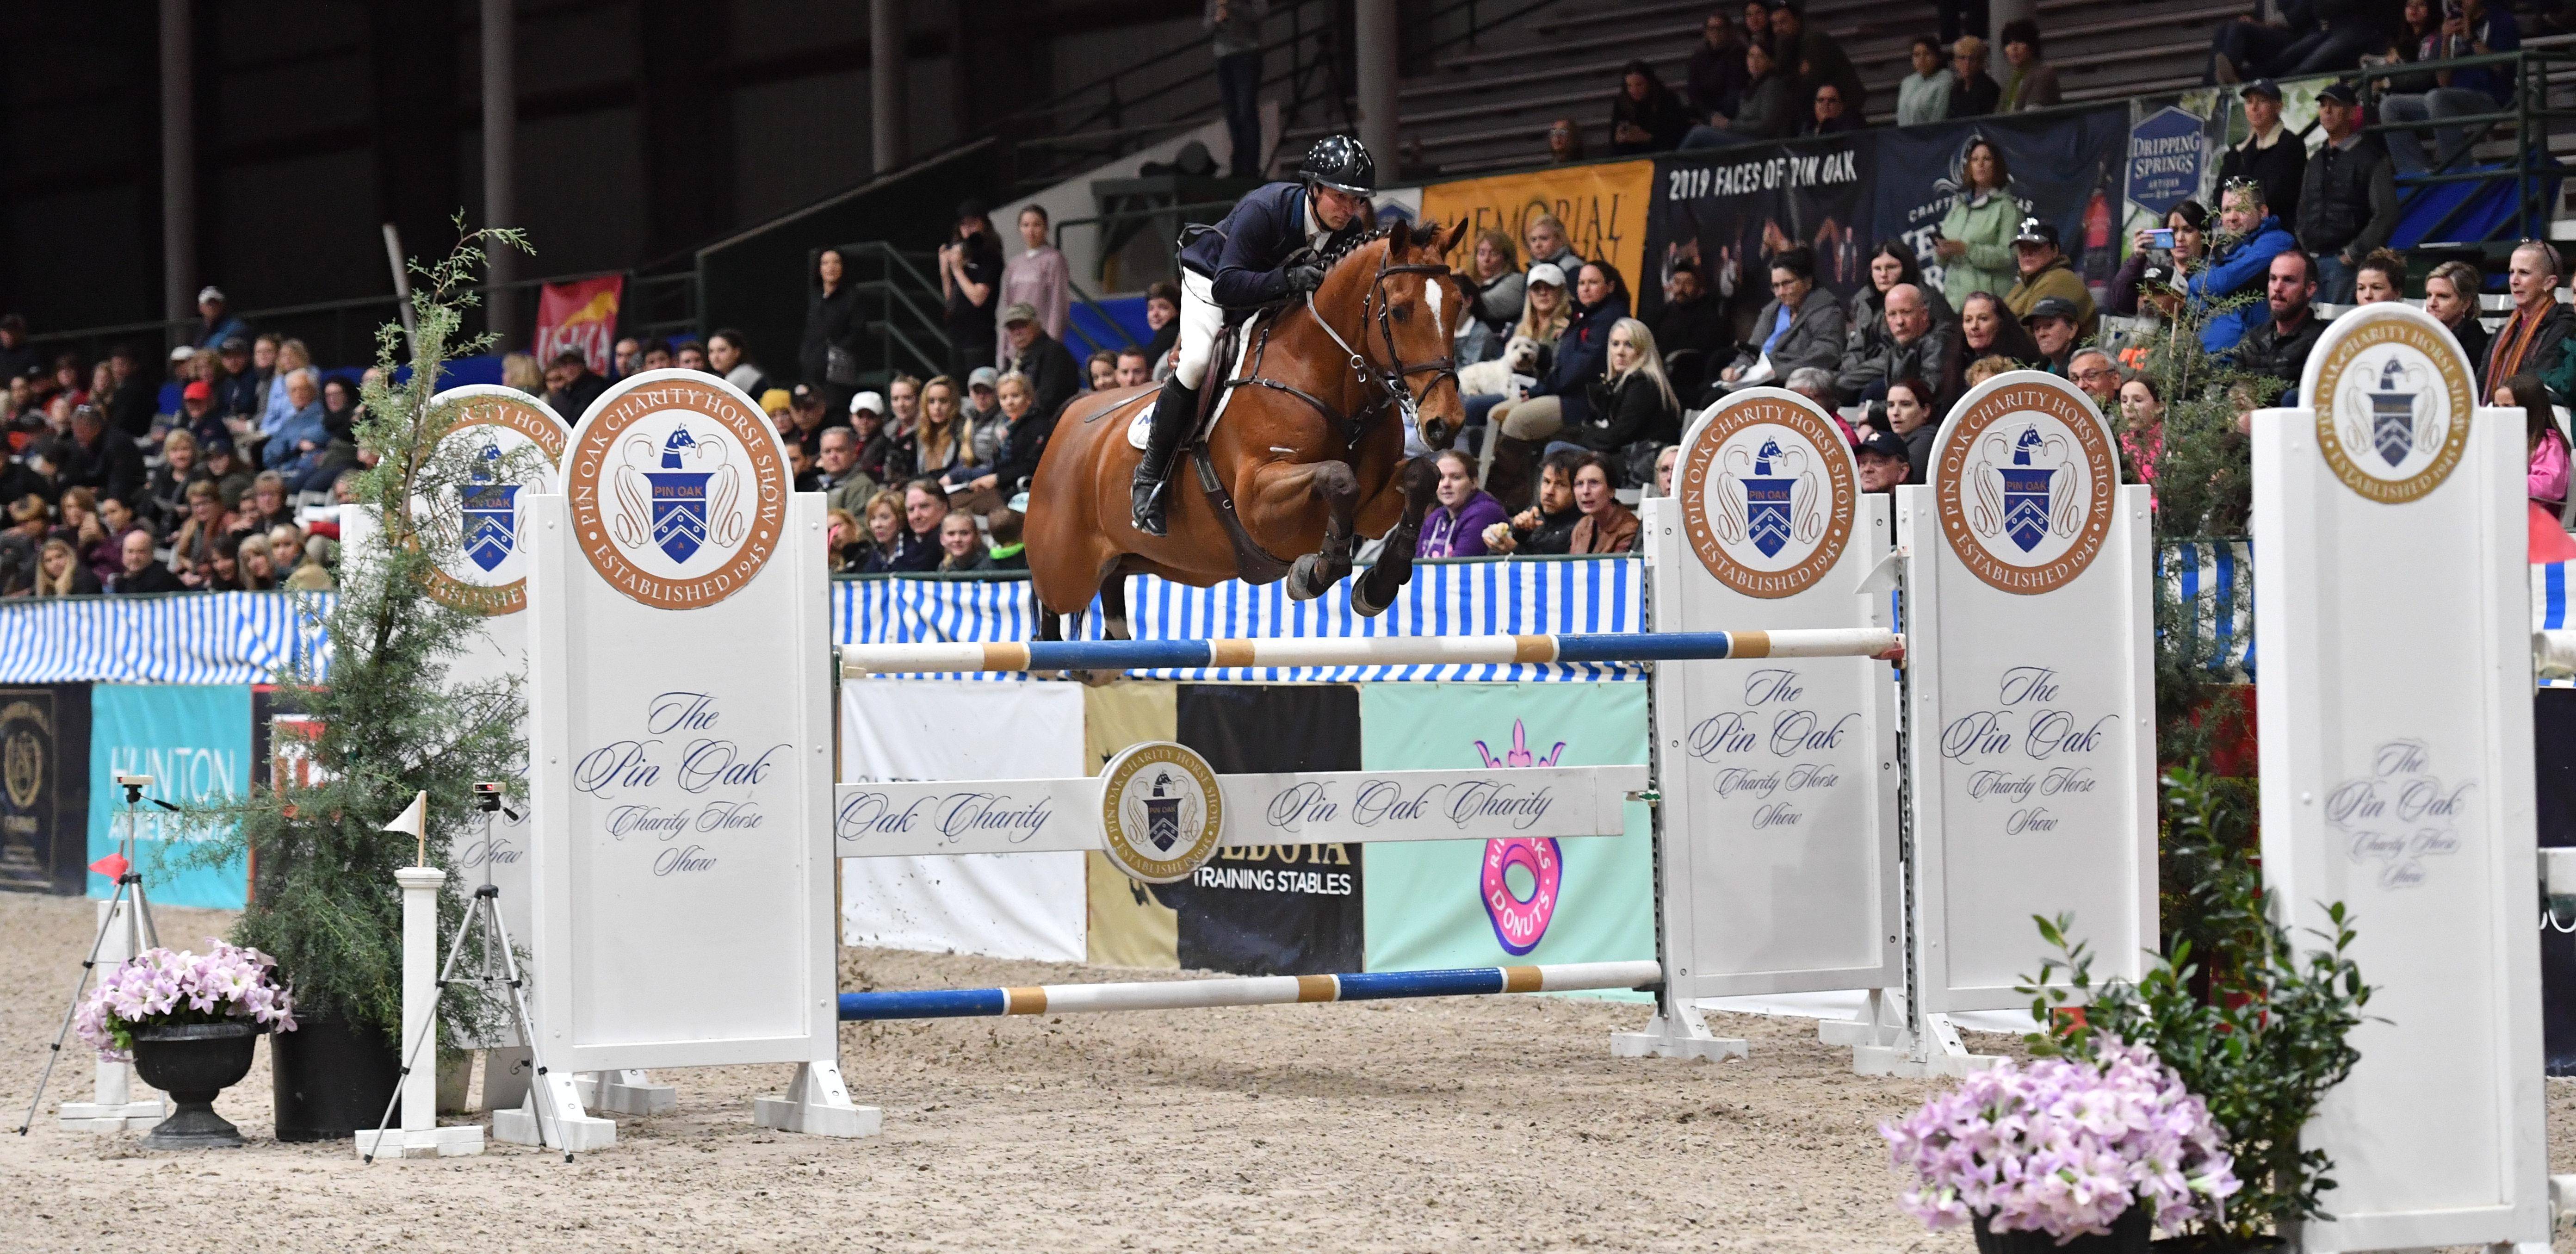 About Pin Oak | The Pin Oak Charity Horse Show